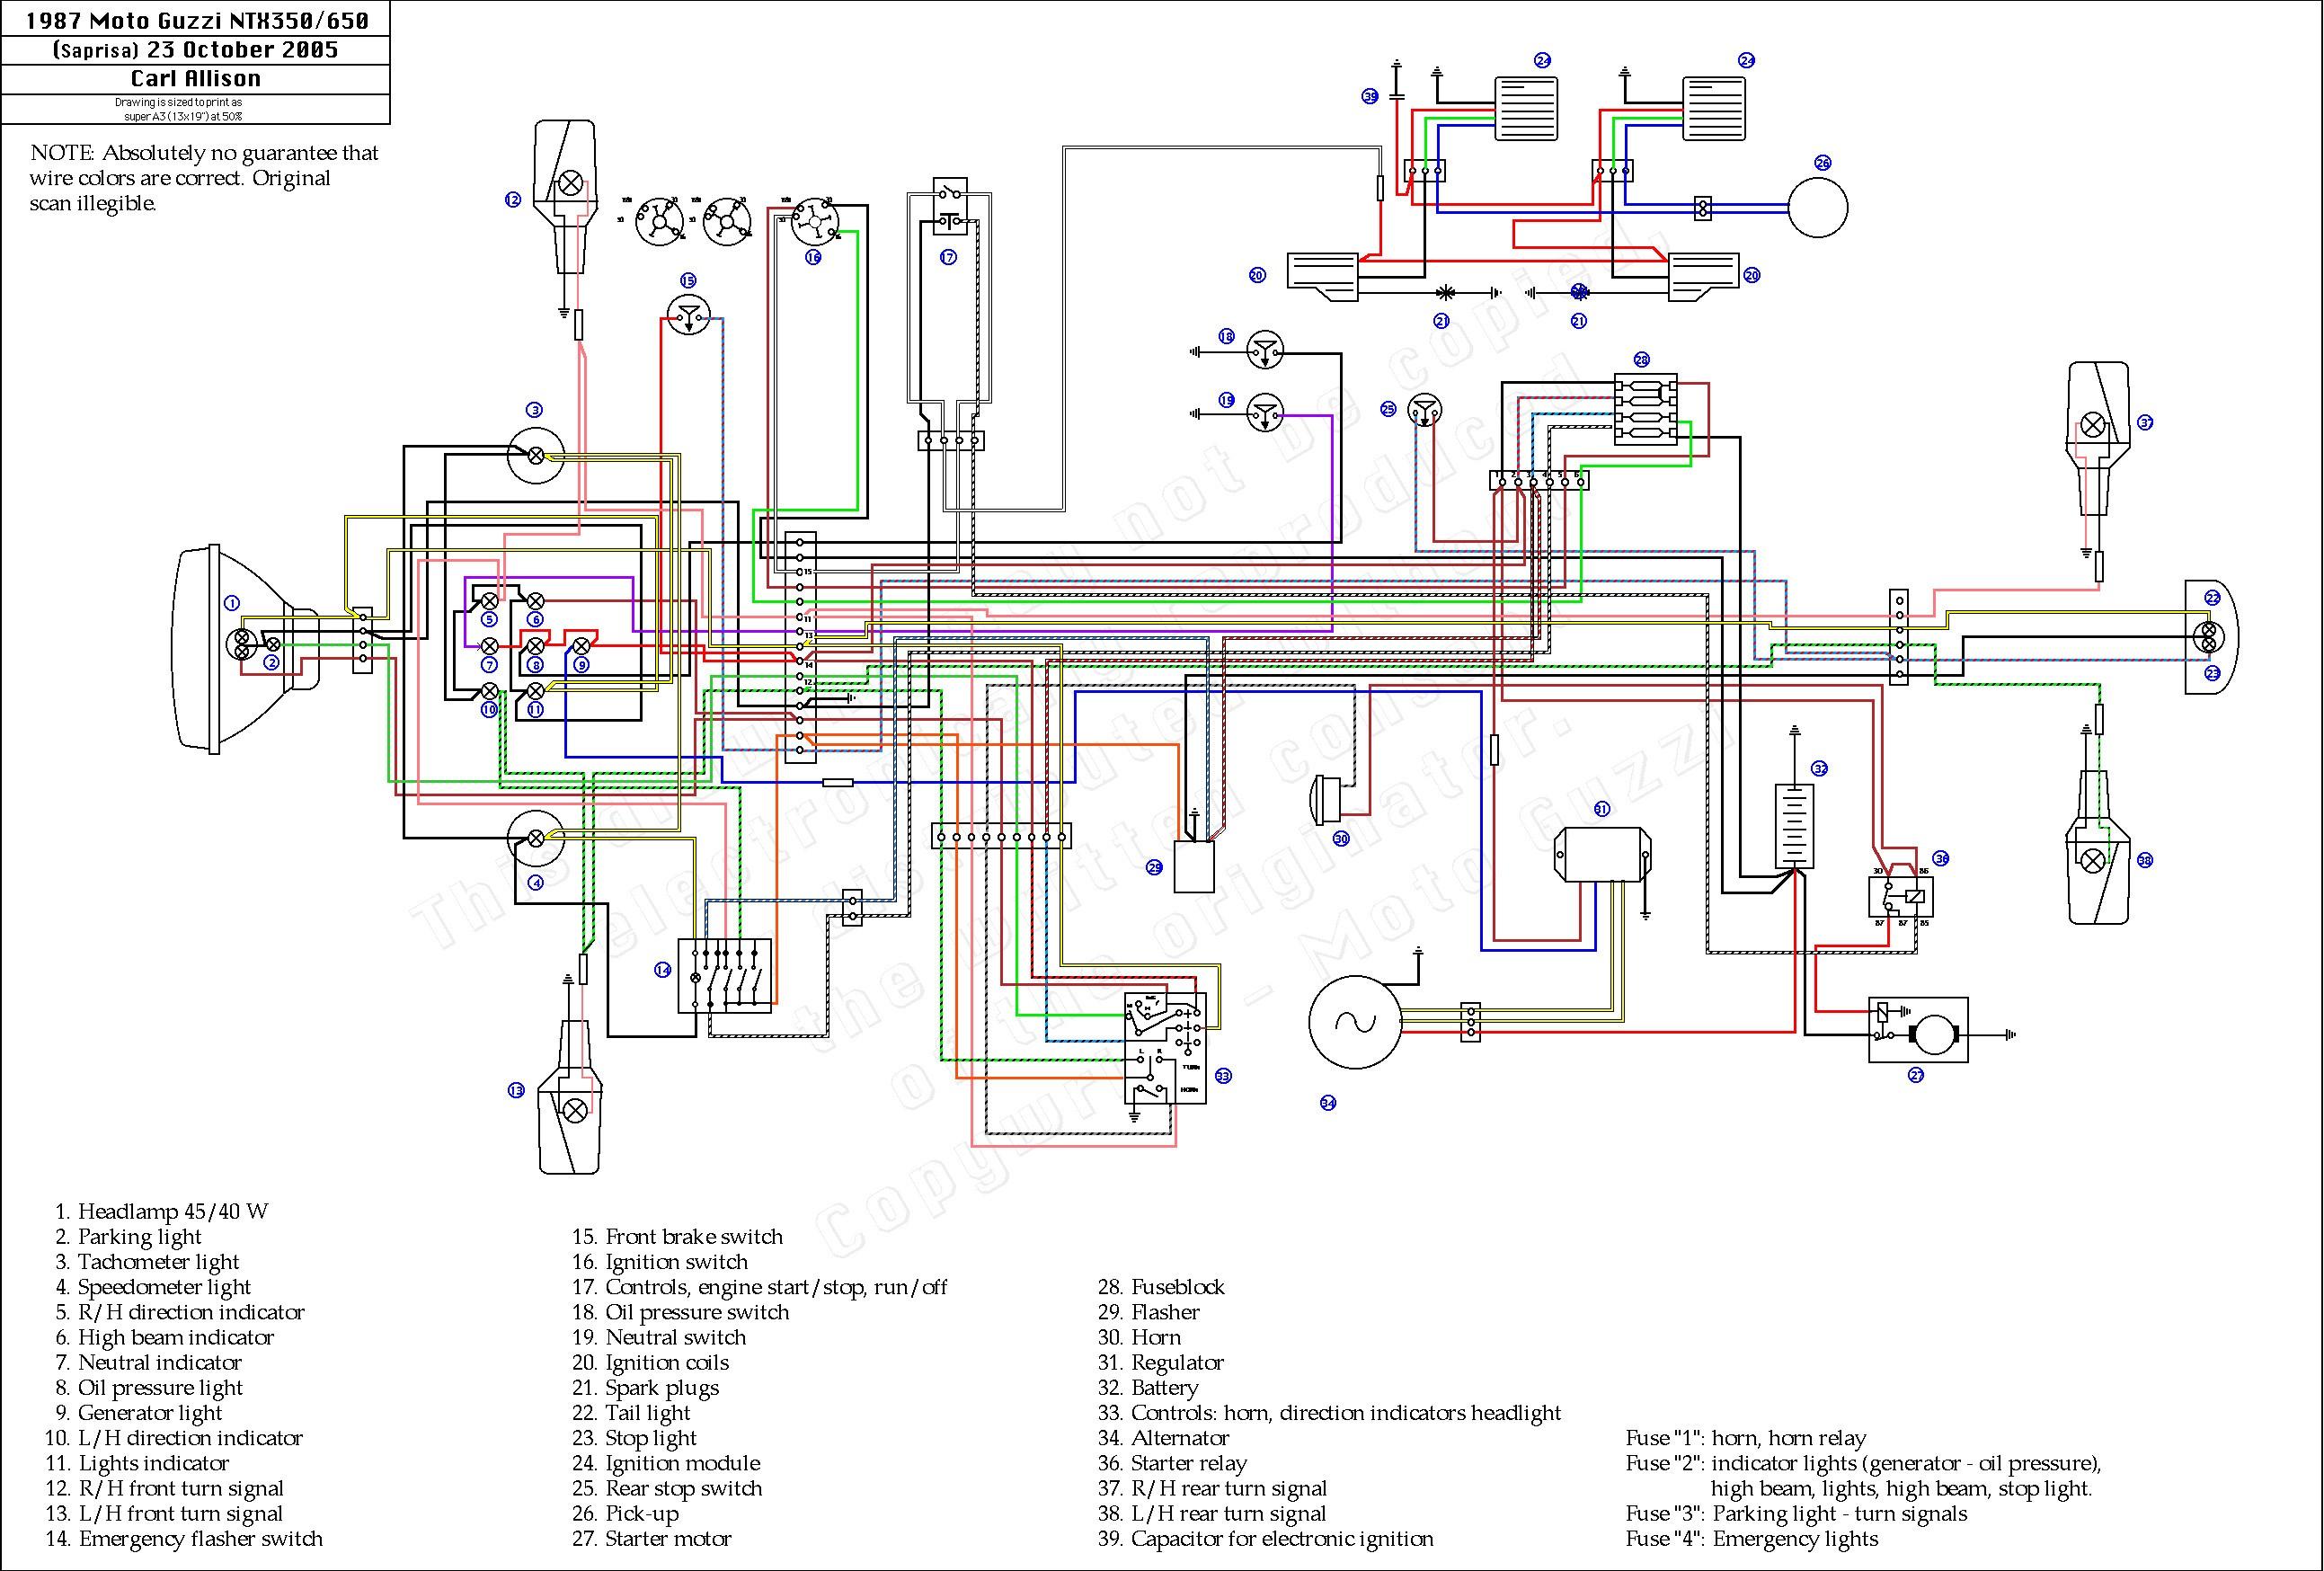 KY_2346] Workhorse 5 Ballast Wiring Diagram Free Picture Wiring Diagram  Wiring Diagram   Workhorse Parking Light Wire Diagrams      Rally Puti Mohammedshrine Librar Wiring 101